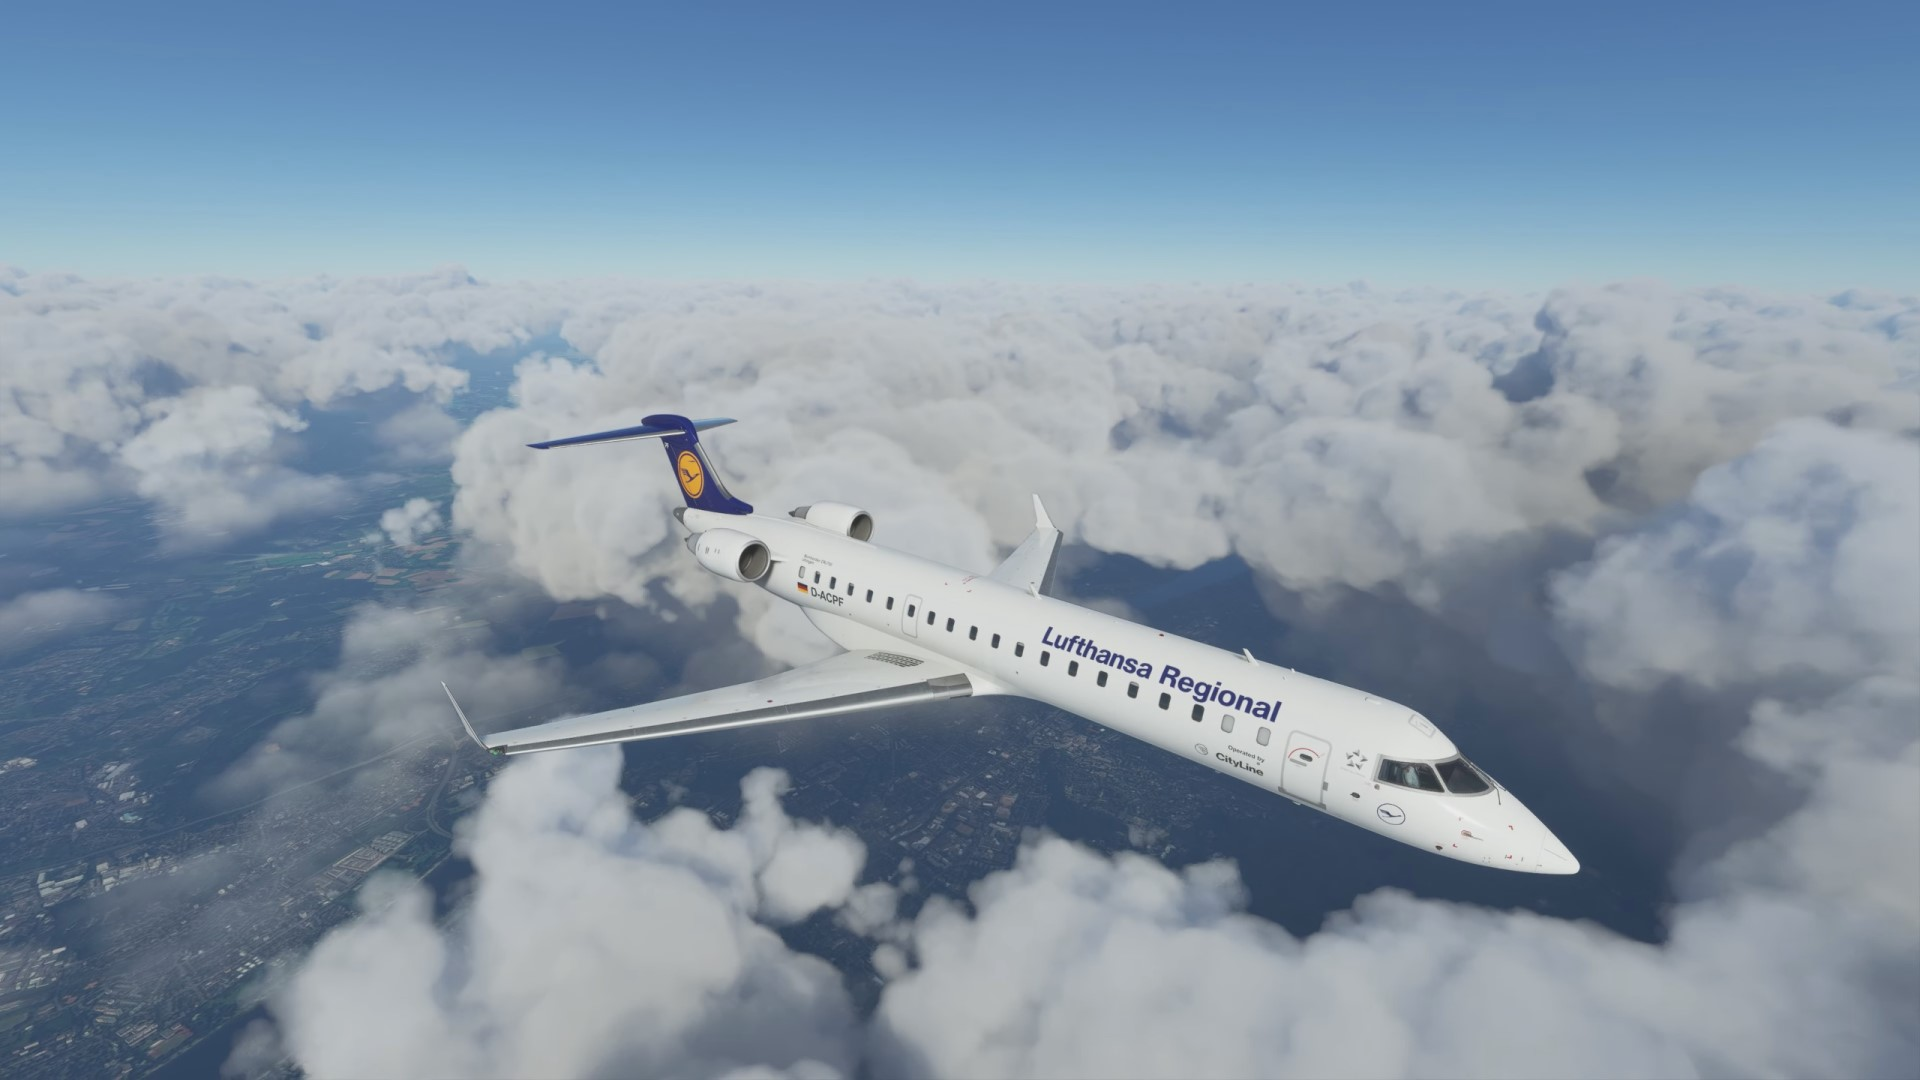 Flight Simulator is getting its first complex passenger jet, the CRJ